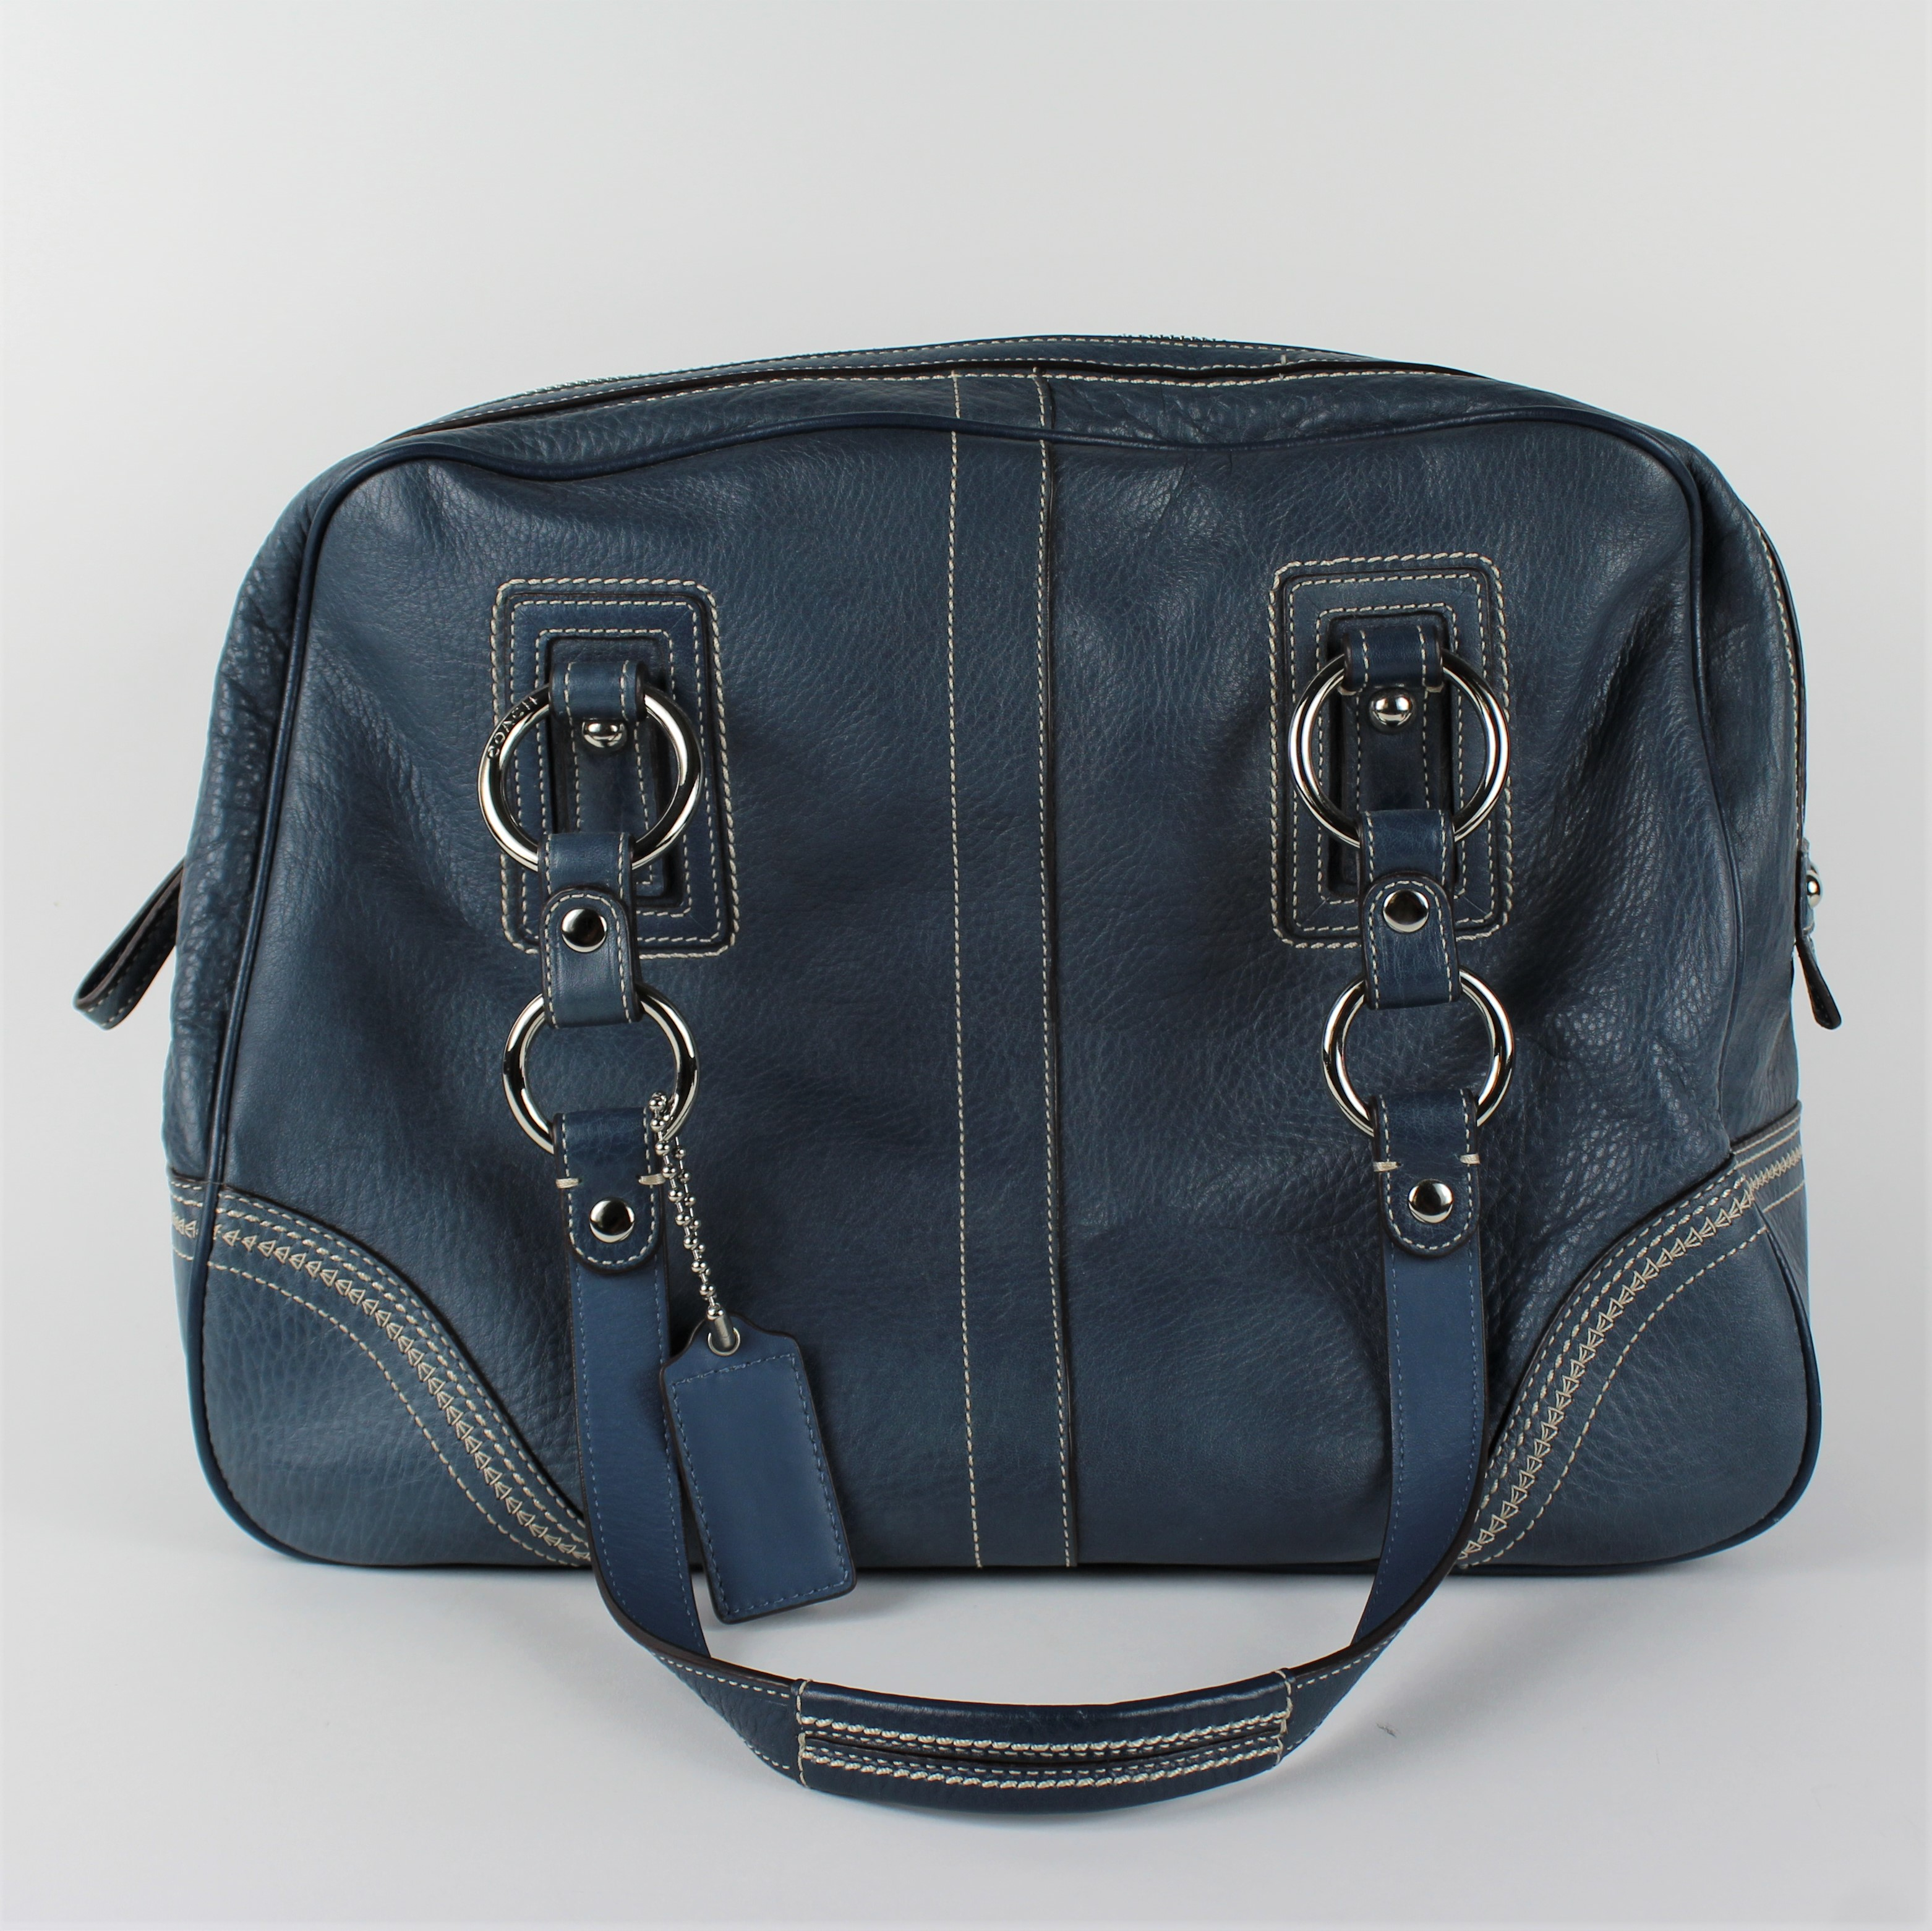 a15b27a81a ... germany coach blue leather satchel handbag b7f2e b002f